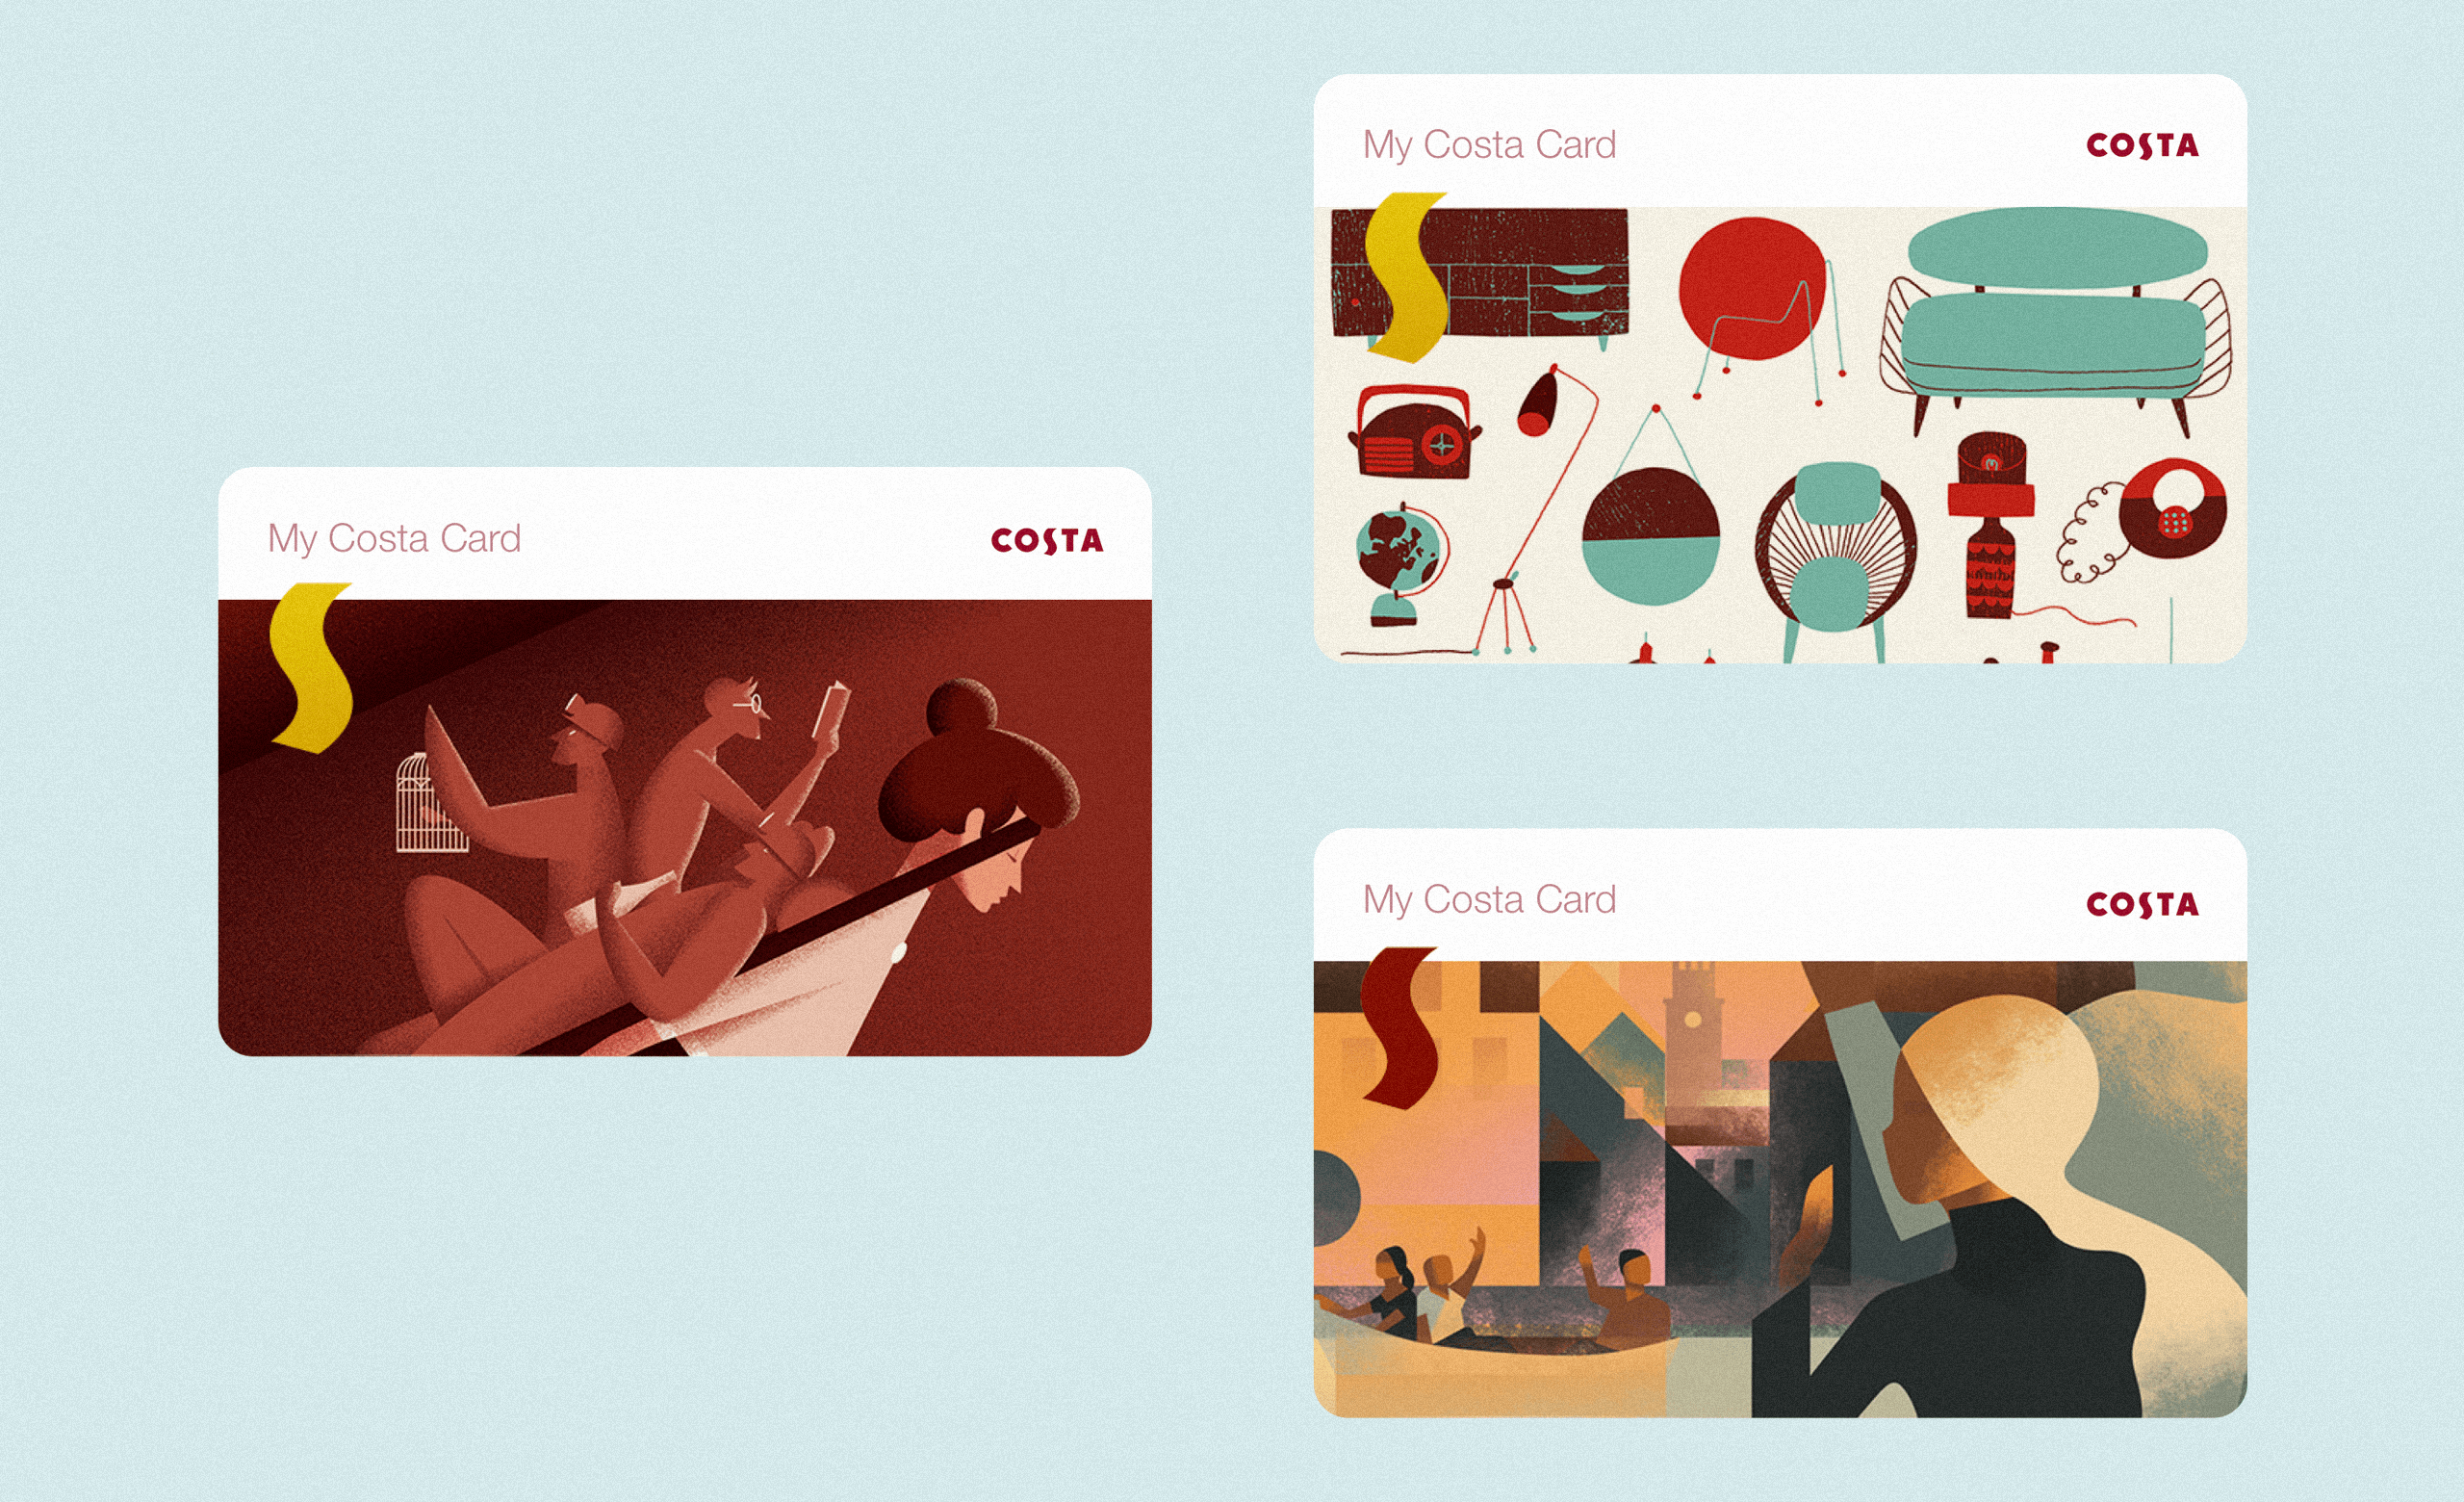 _COSTA-Print-campaign-cards-01a